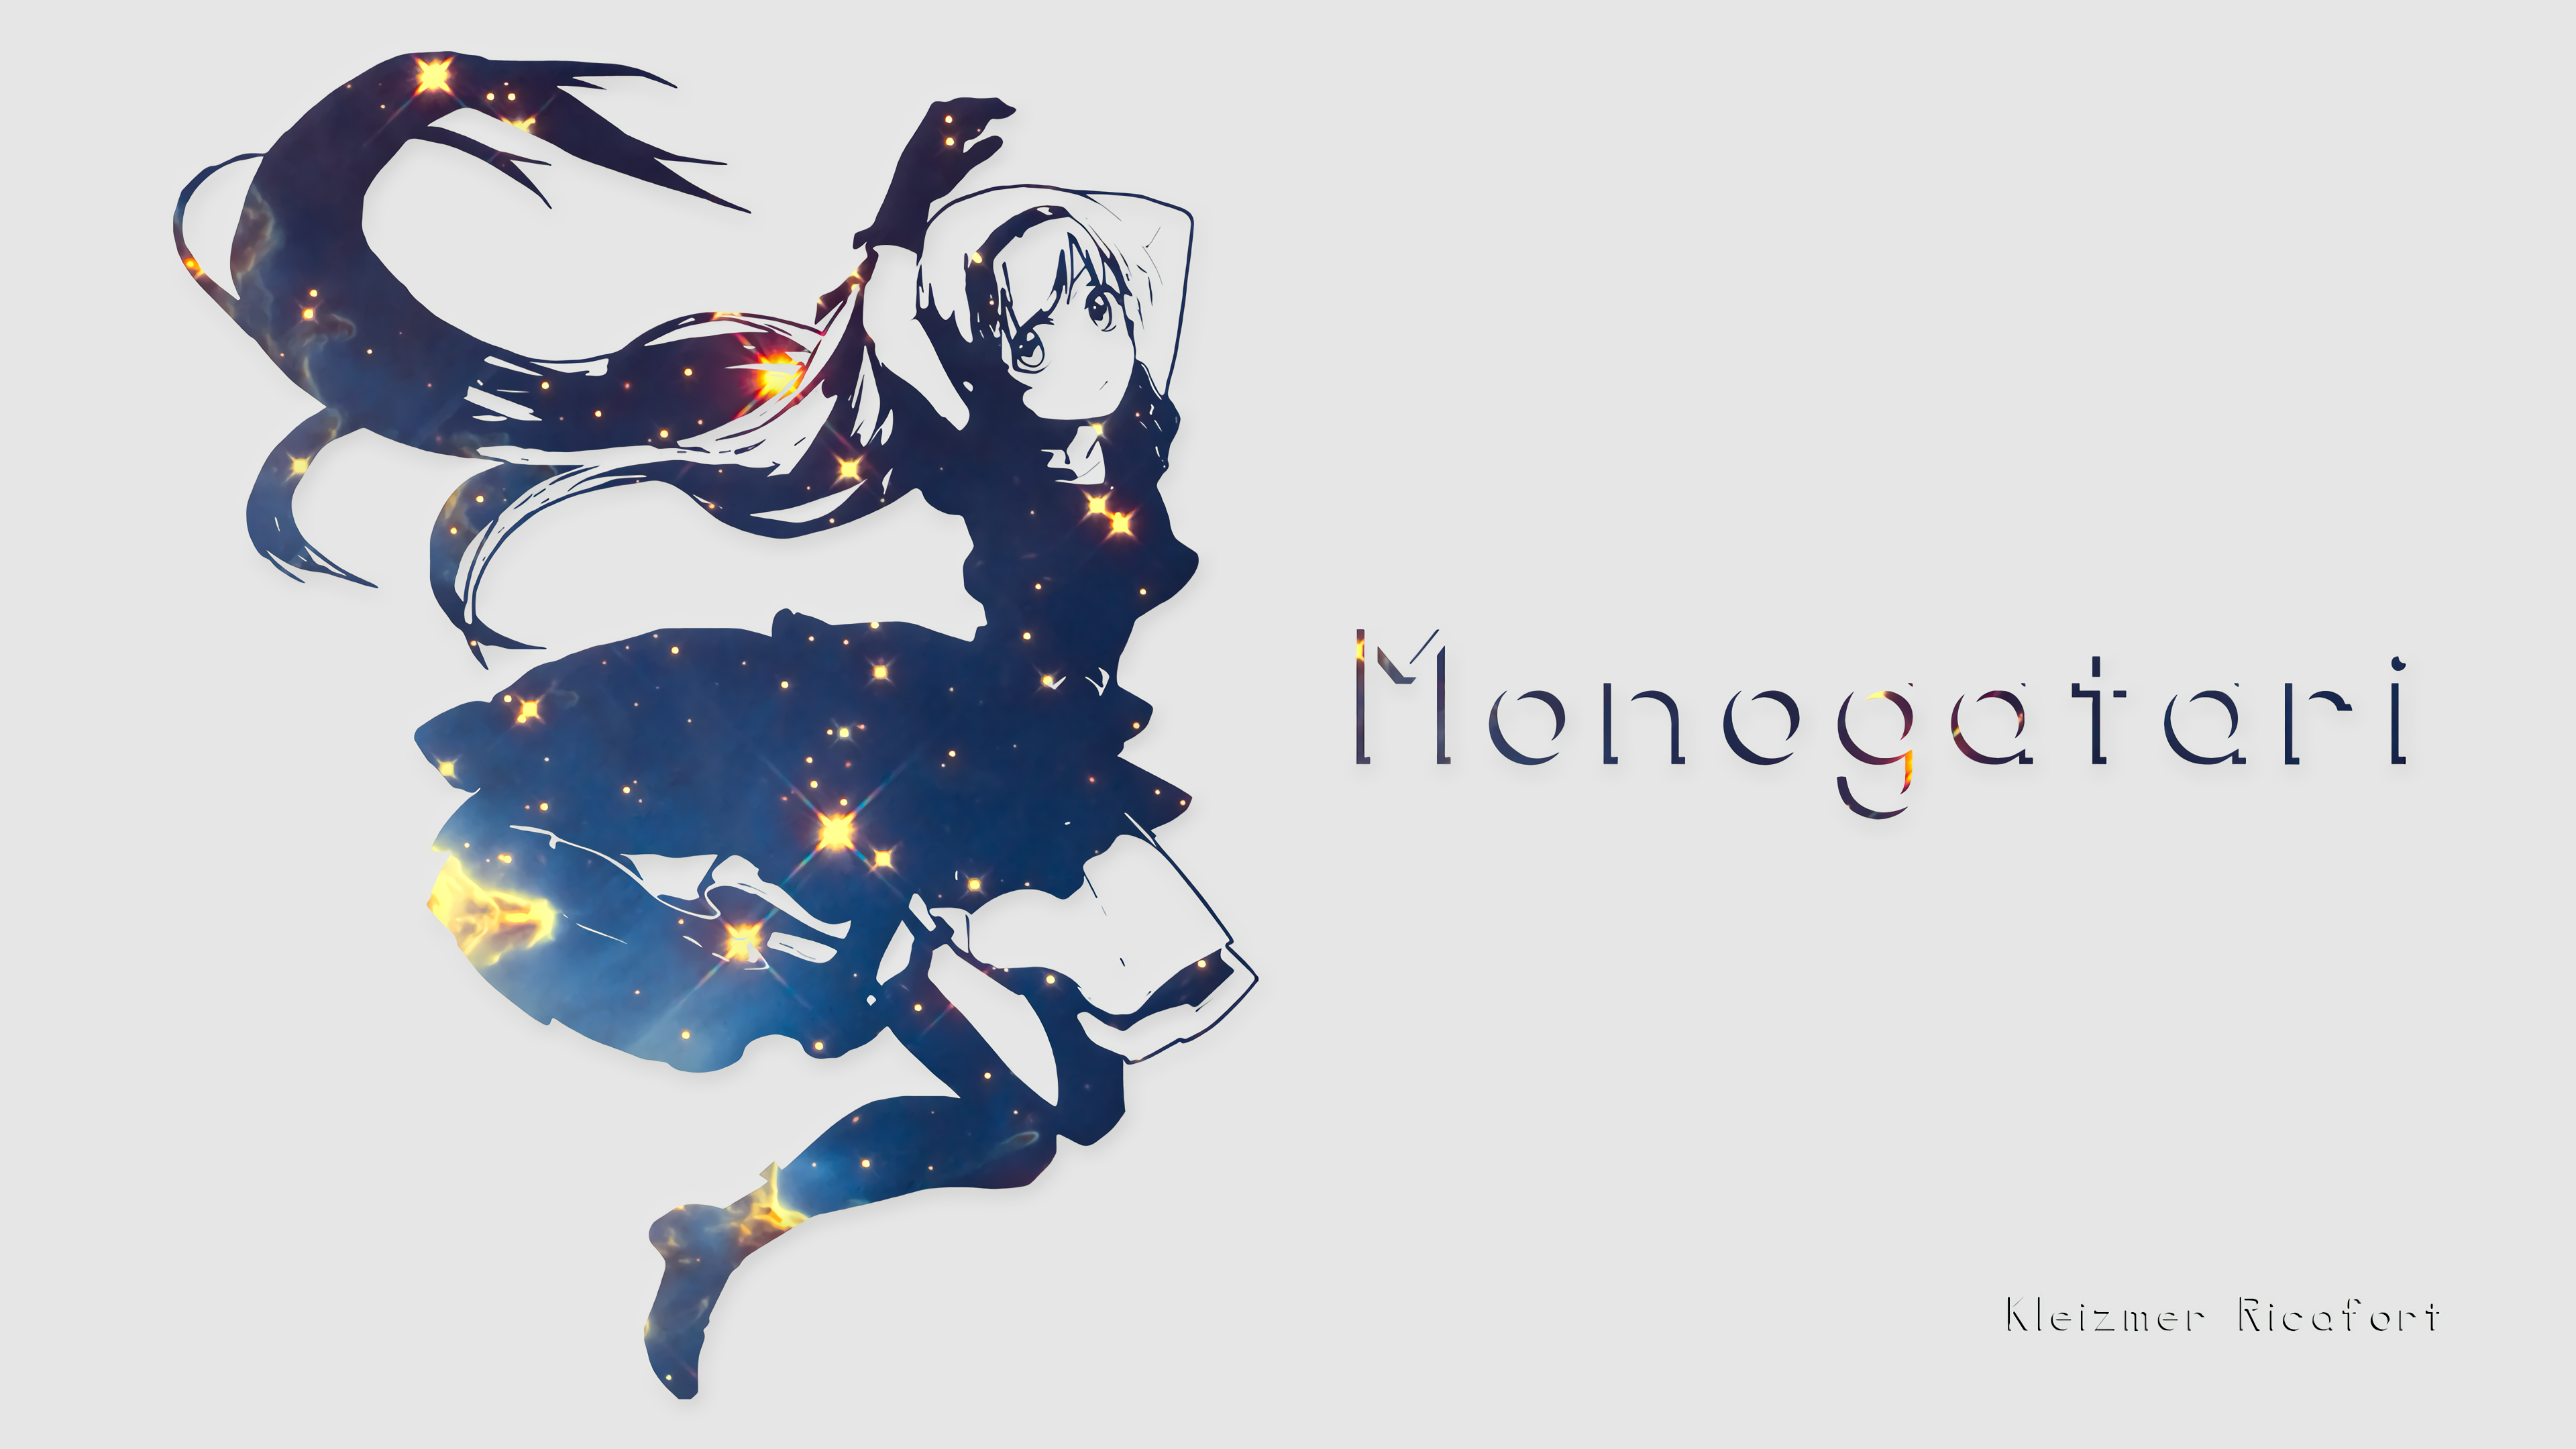 Monogatari Series Wallpapers Top Free Monogatari Series Backgrounds Wallpaperaccess